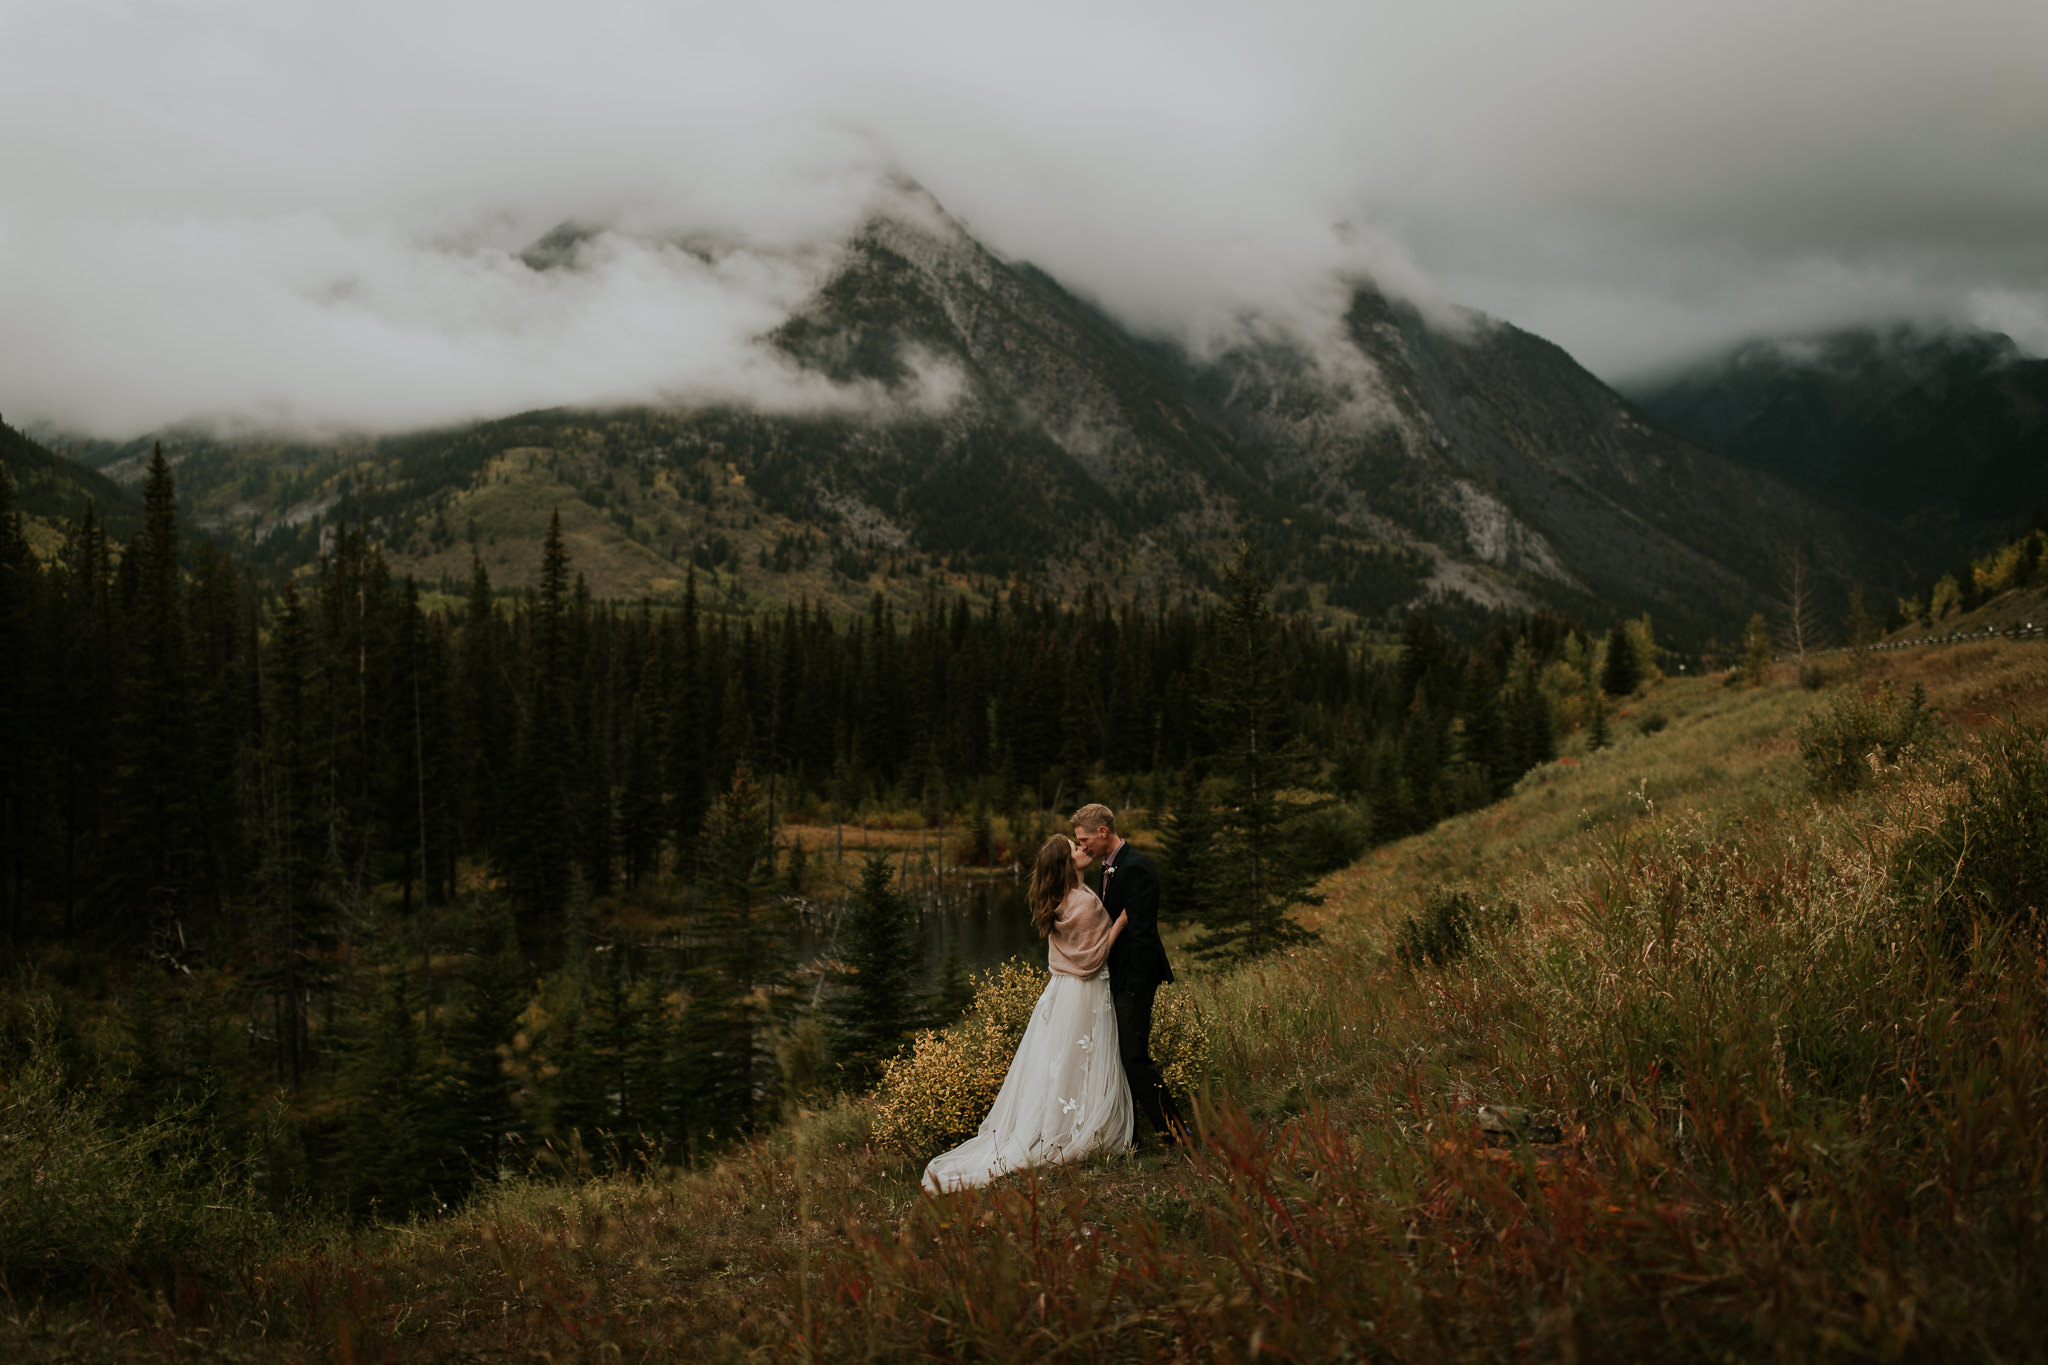 Weddings - Capturing intimate love & elopements in beautiful destinations…